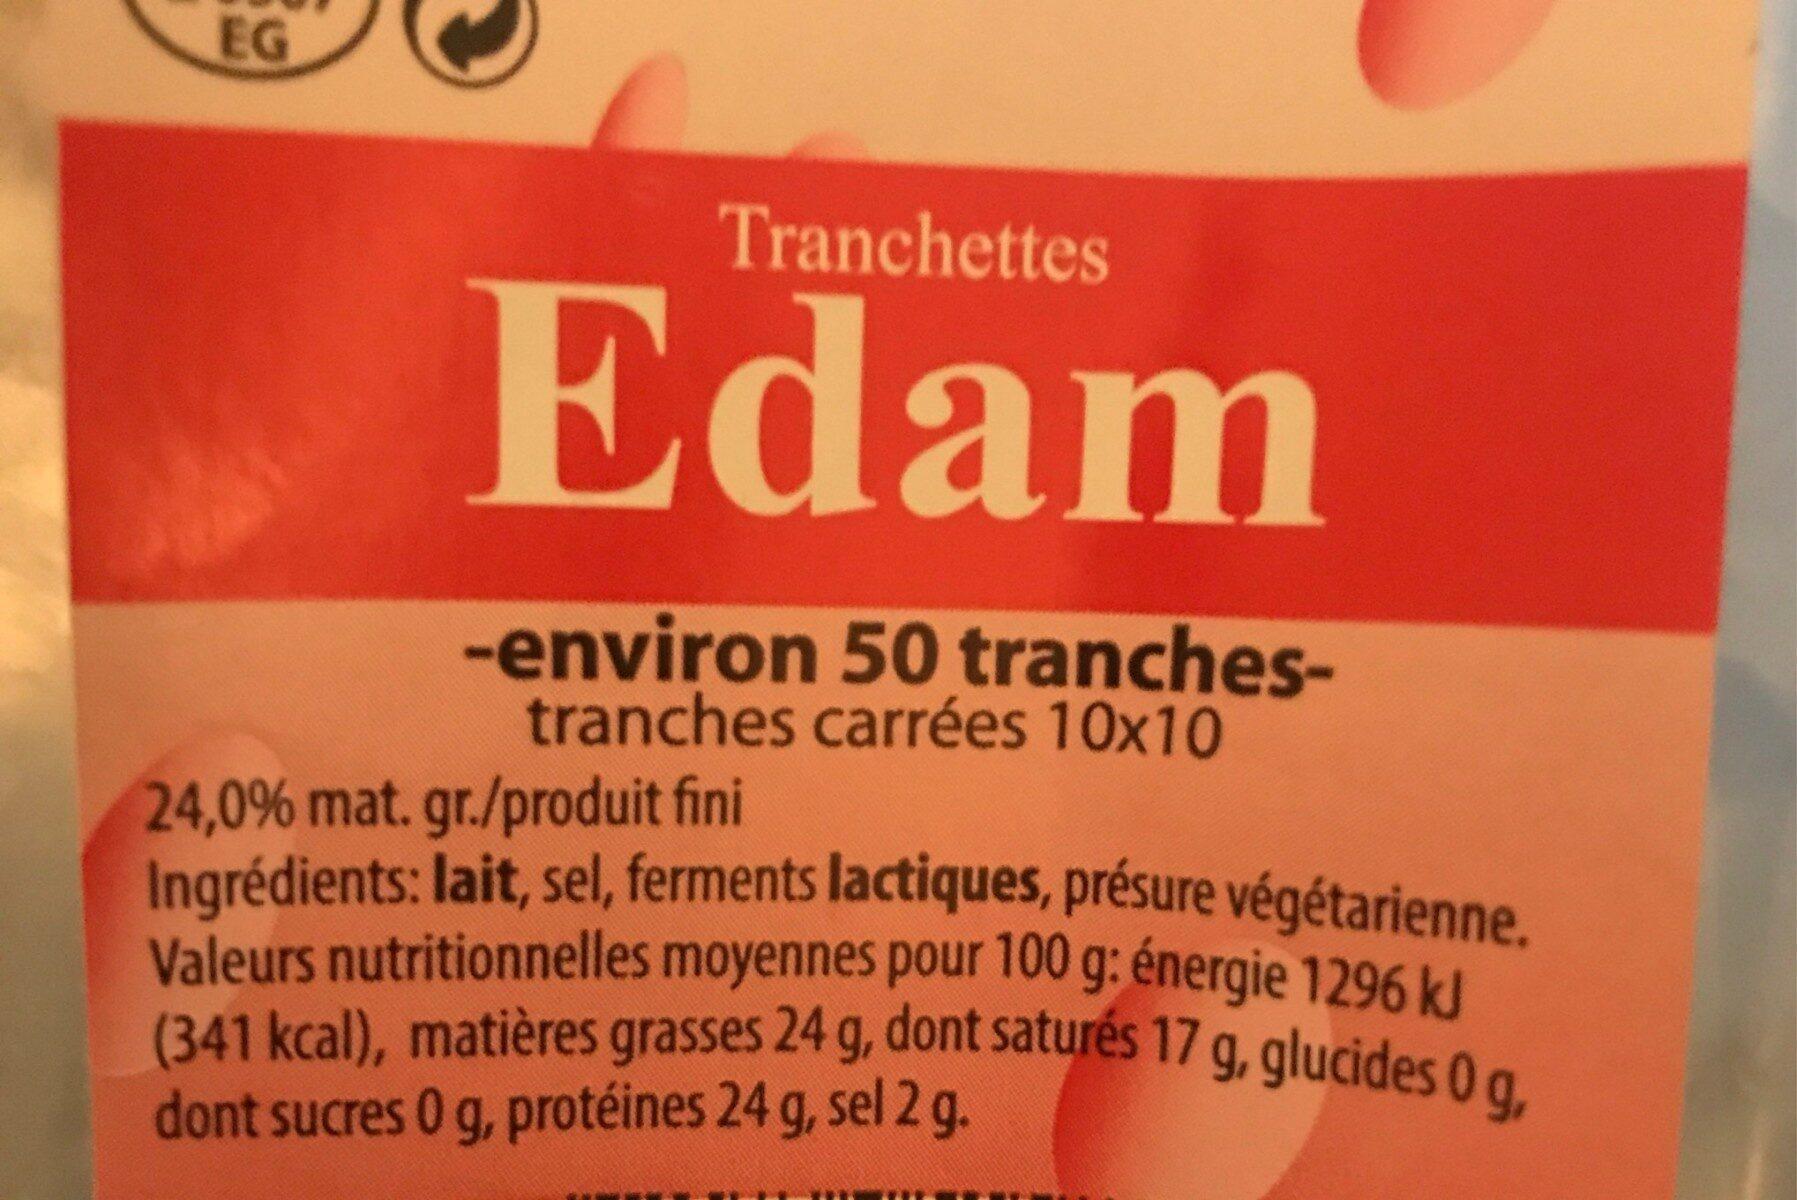 Tranchettes Edam - Voedingswaarden - en